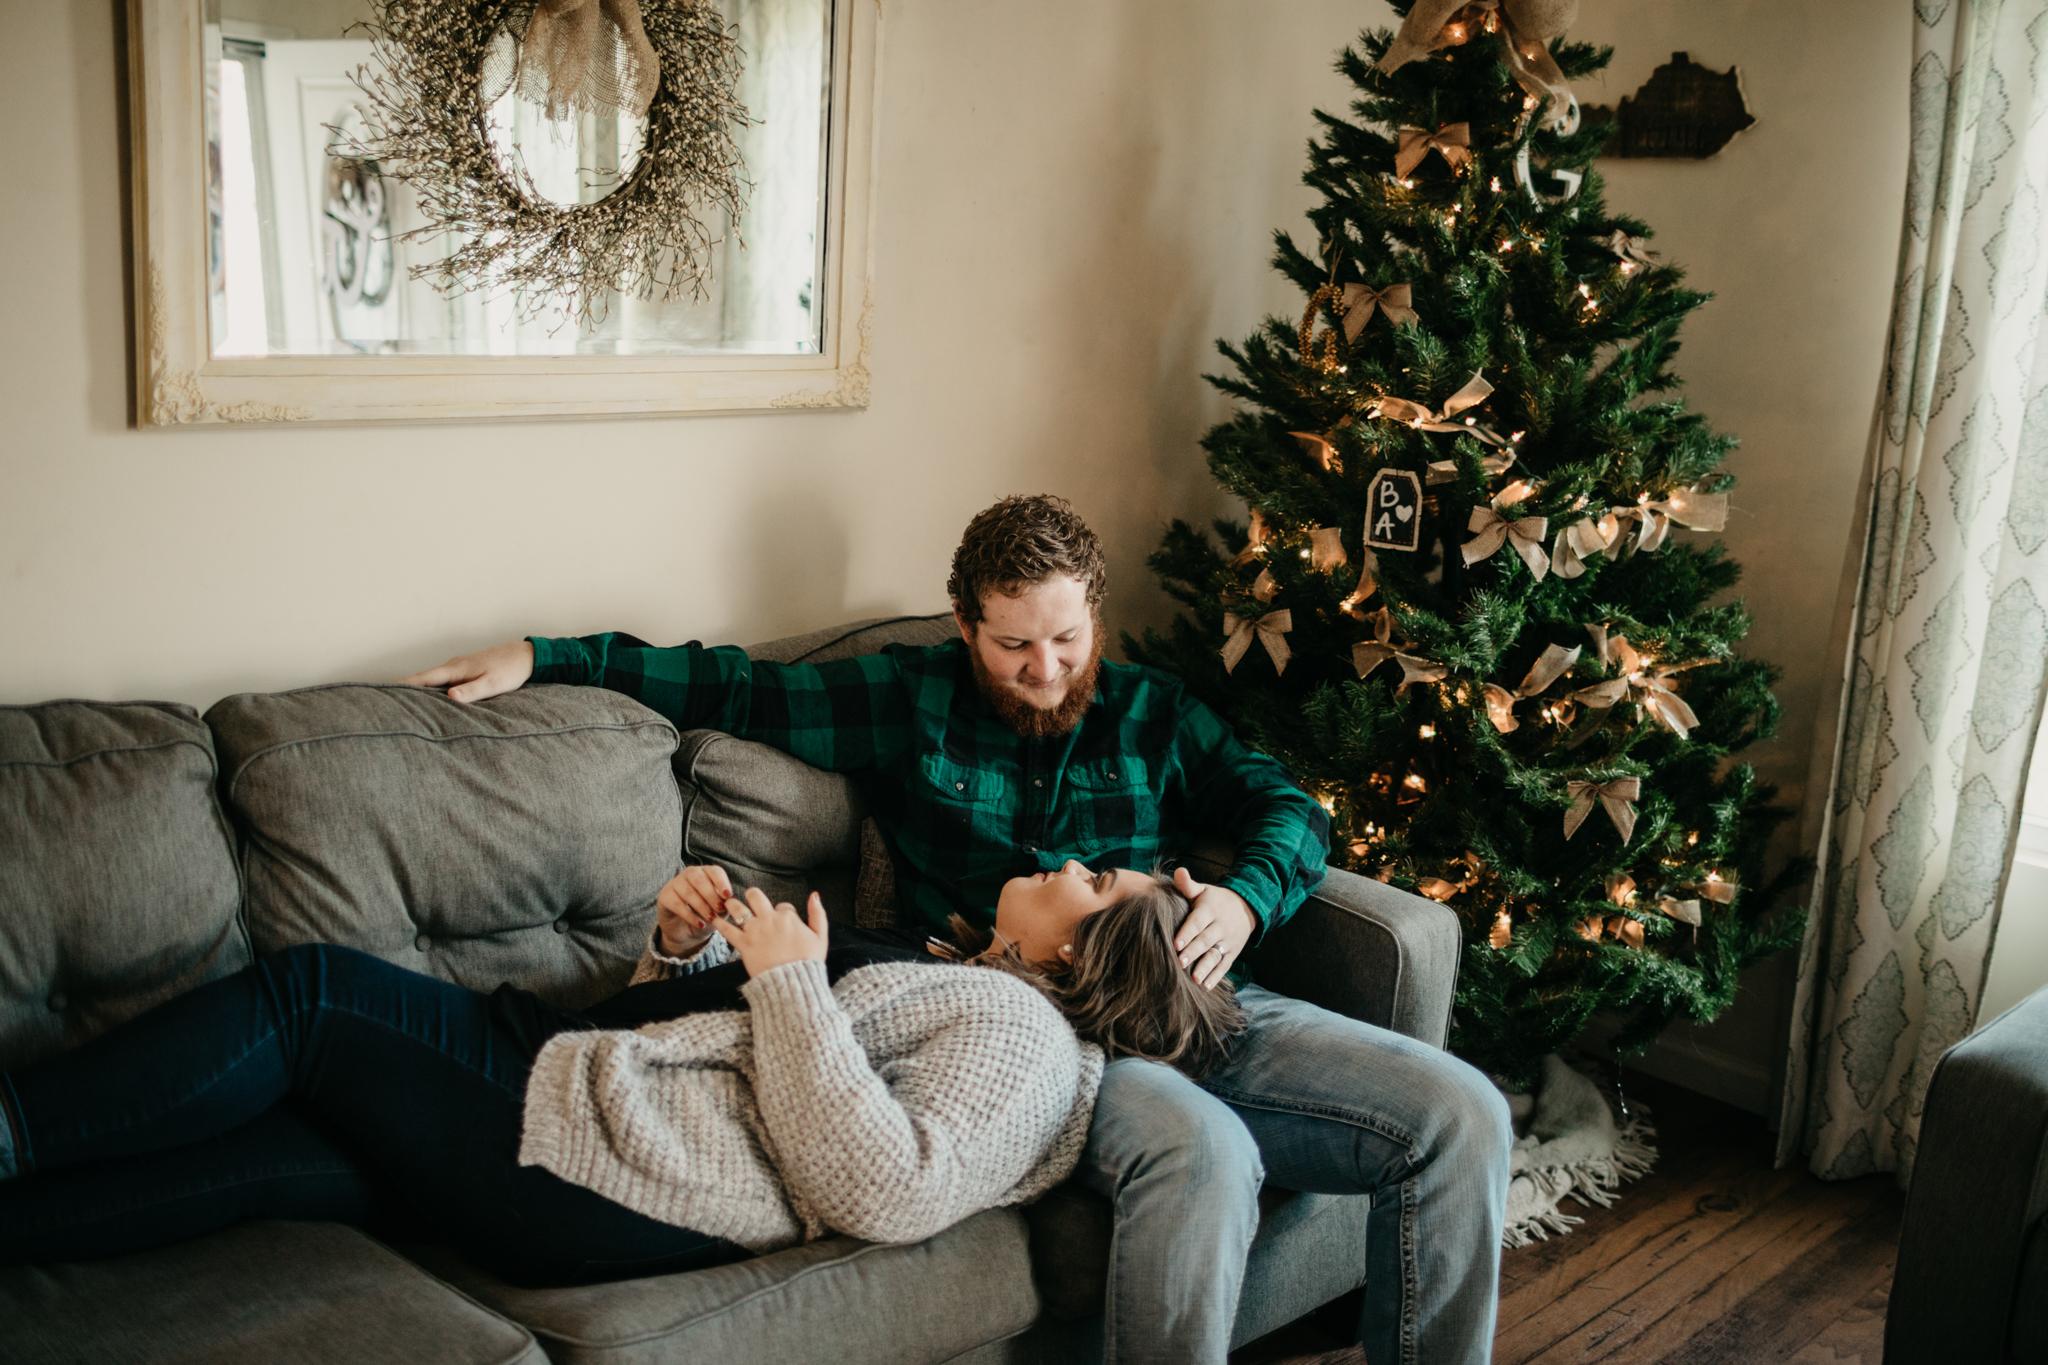 billie-shaye-style-photography-www.billieshayestyle.com-lifestyle-couple-christmas-cuddle-session-nashville-tennessee-8456.jpg